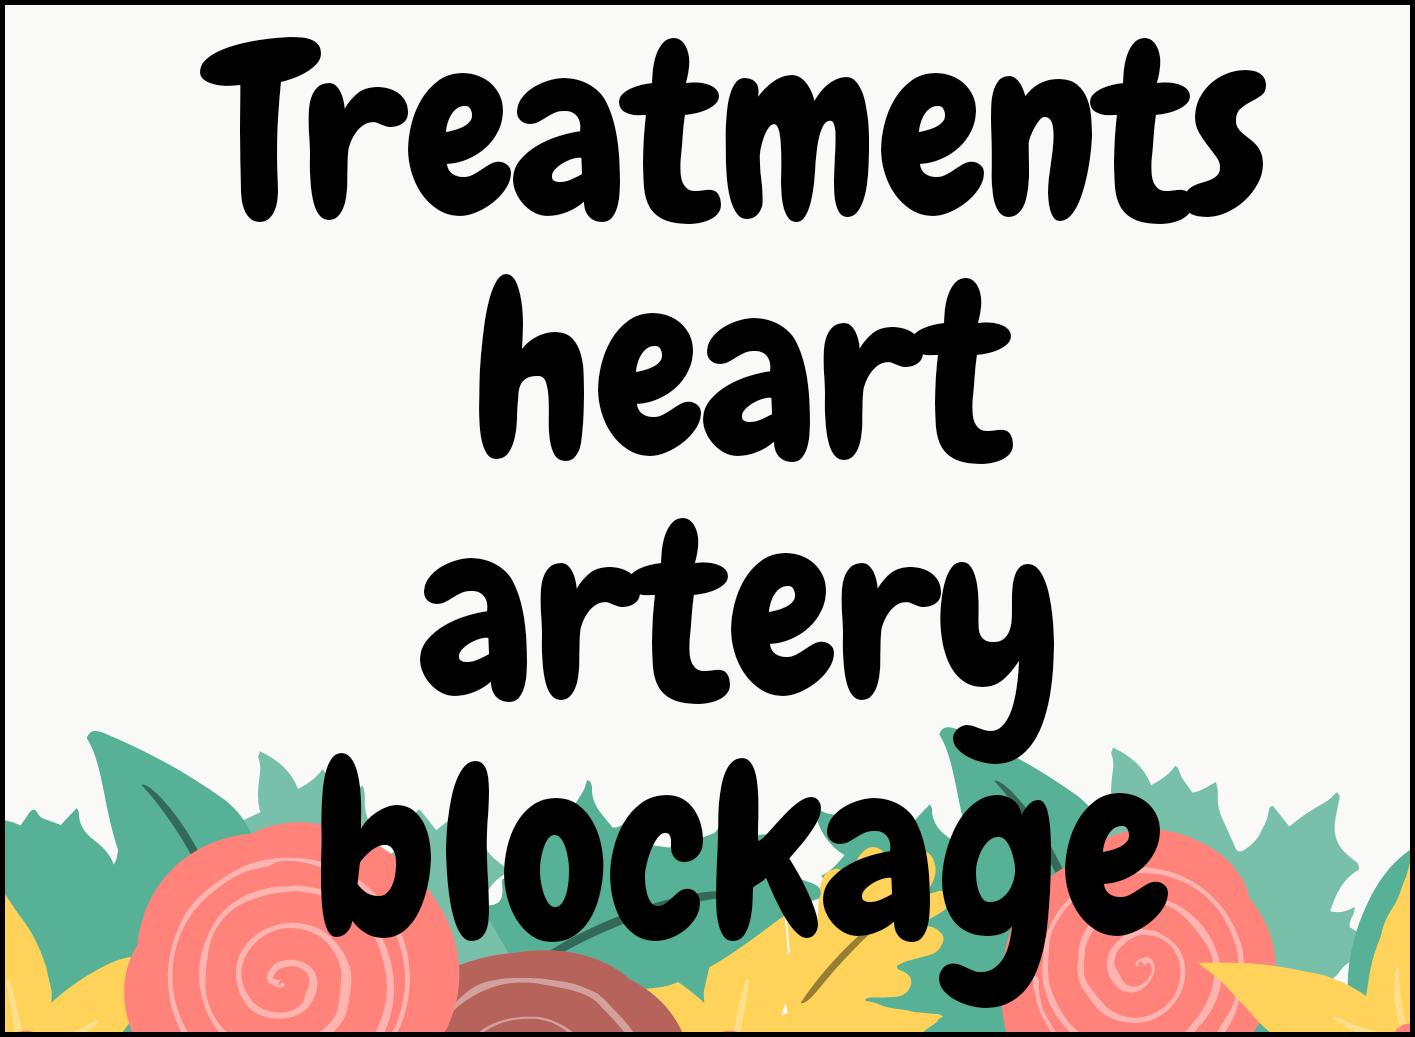 Treatments for heart blockage